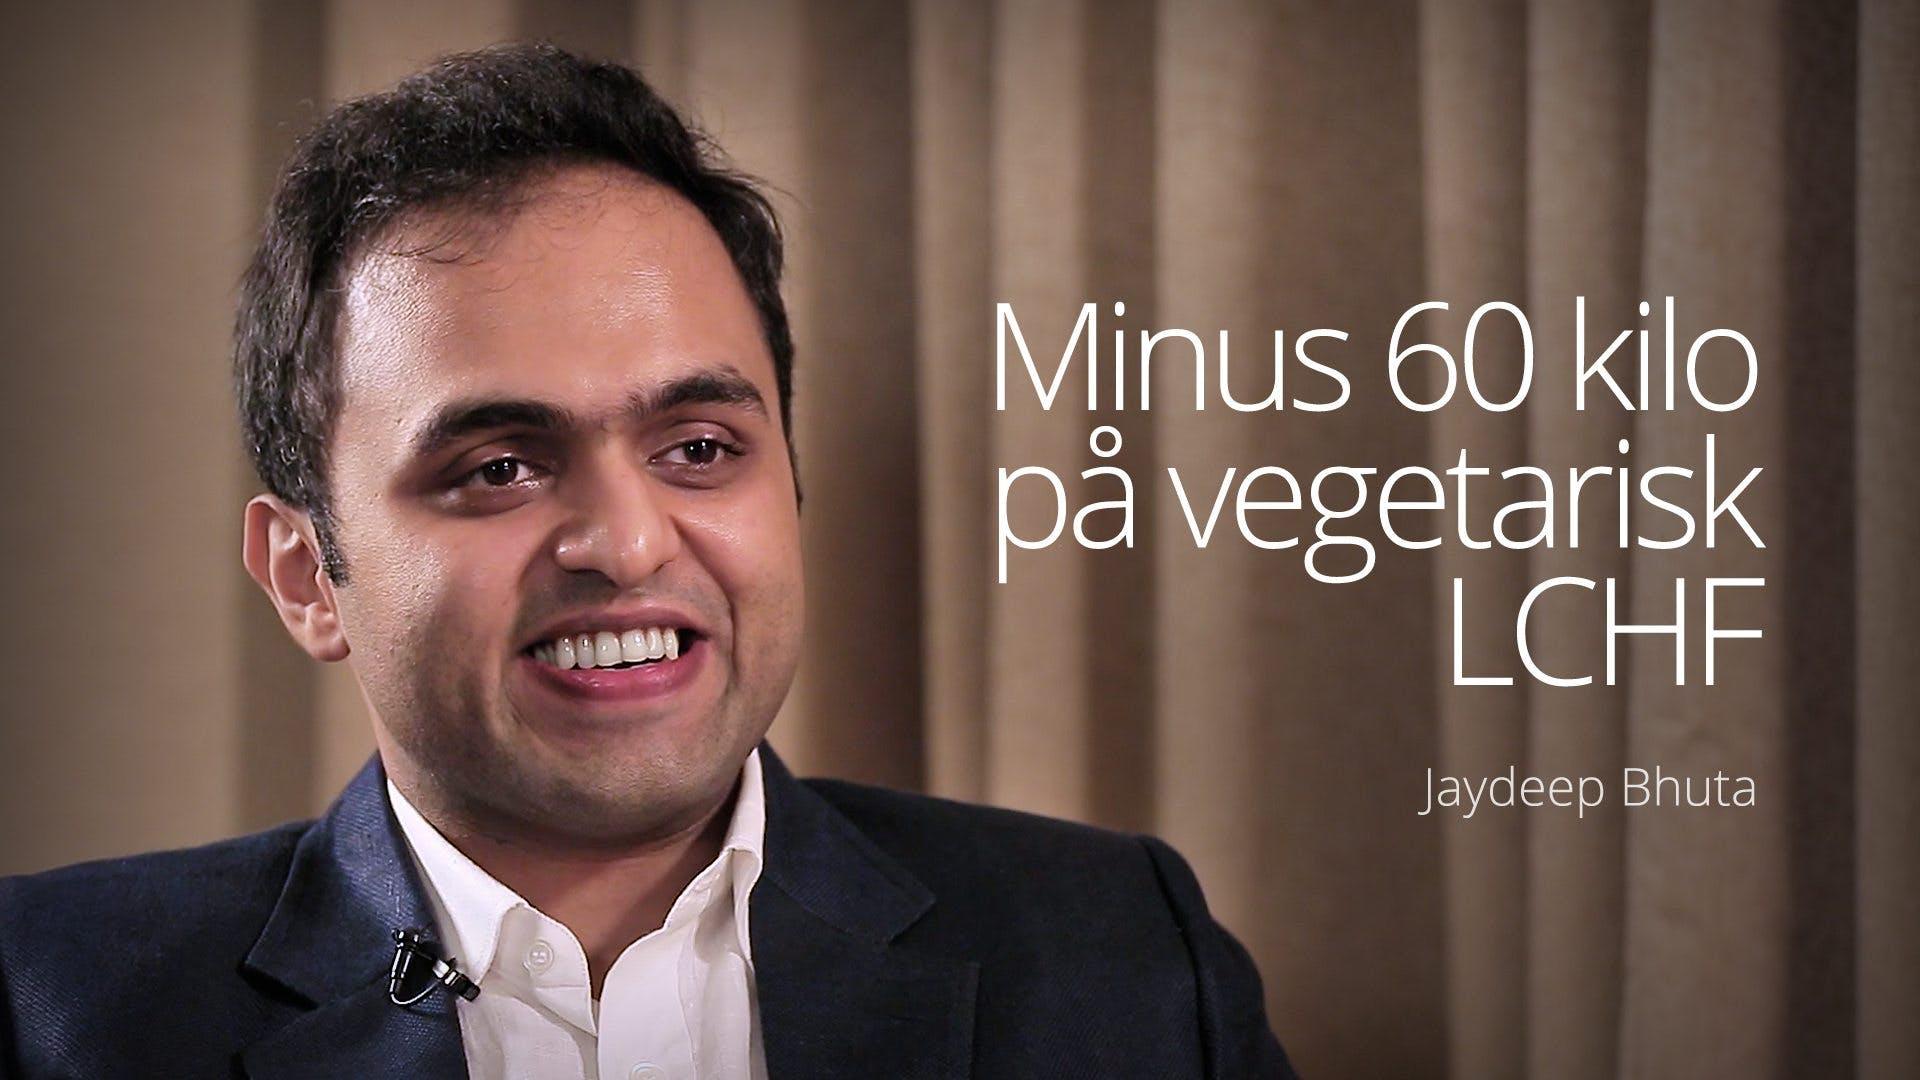 Minus 60 kilo med vegetarisk LCHF